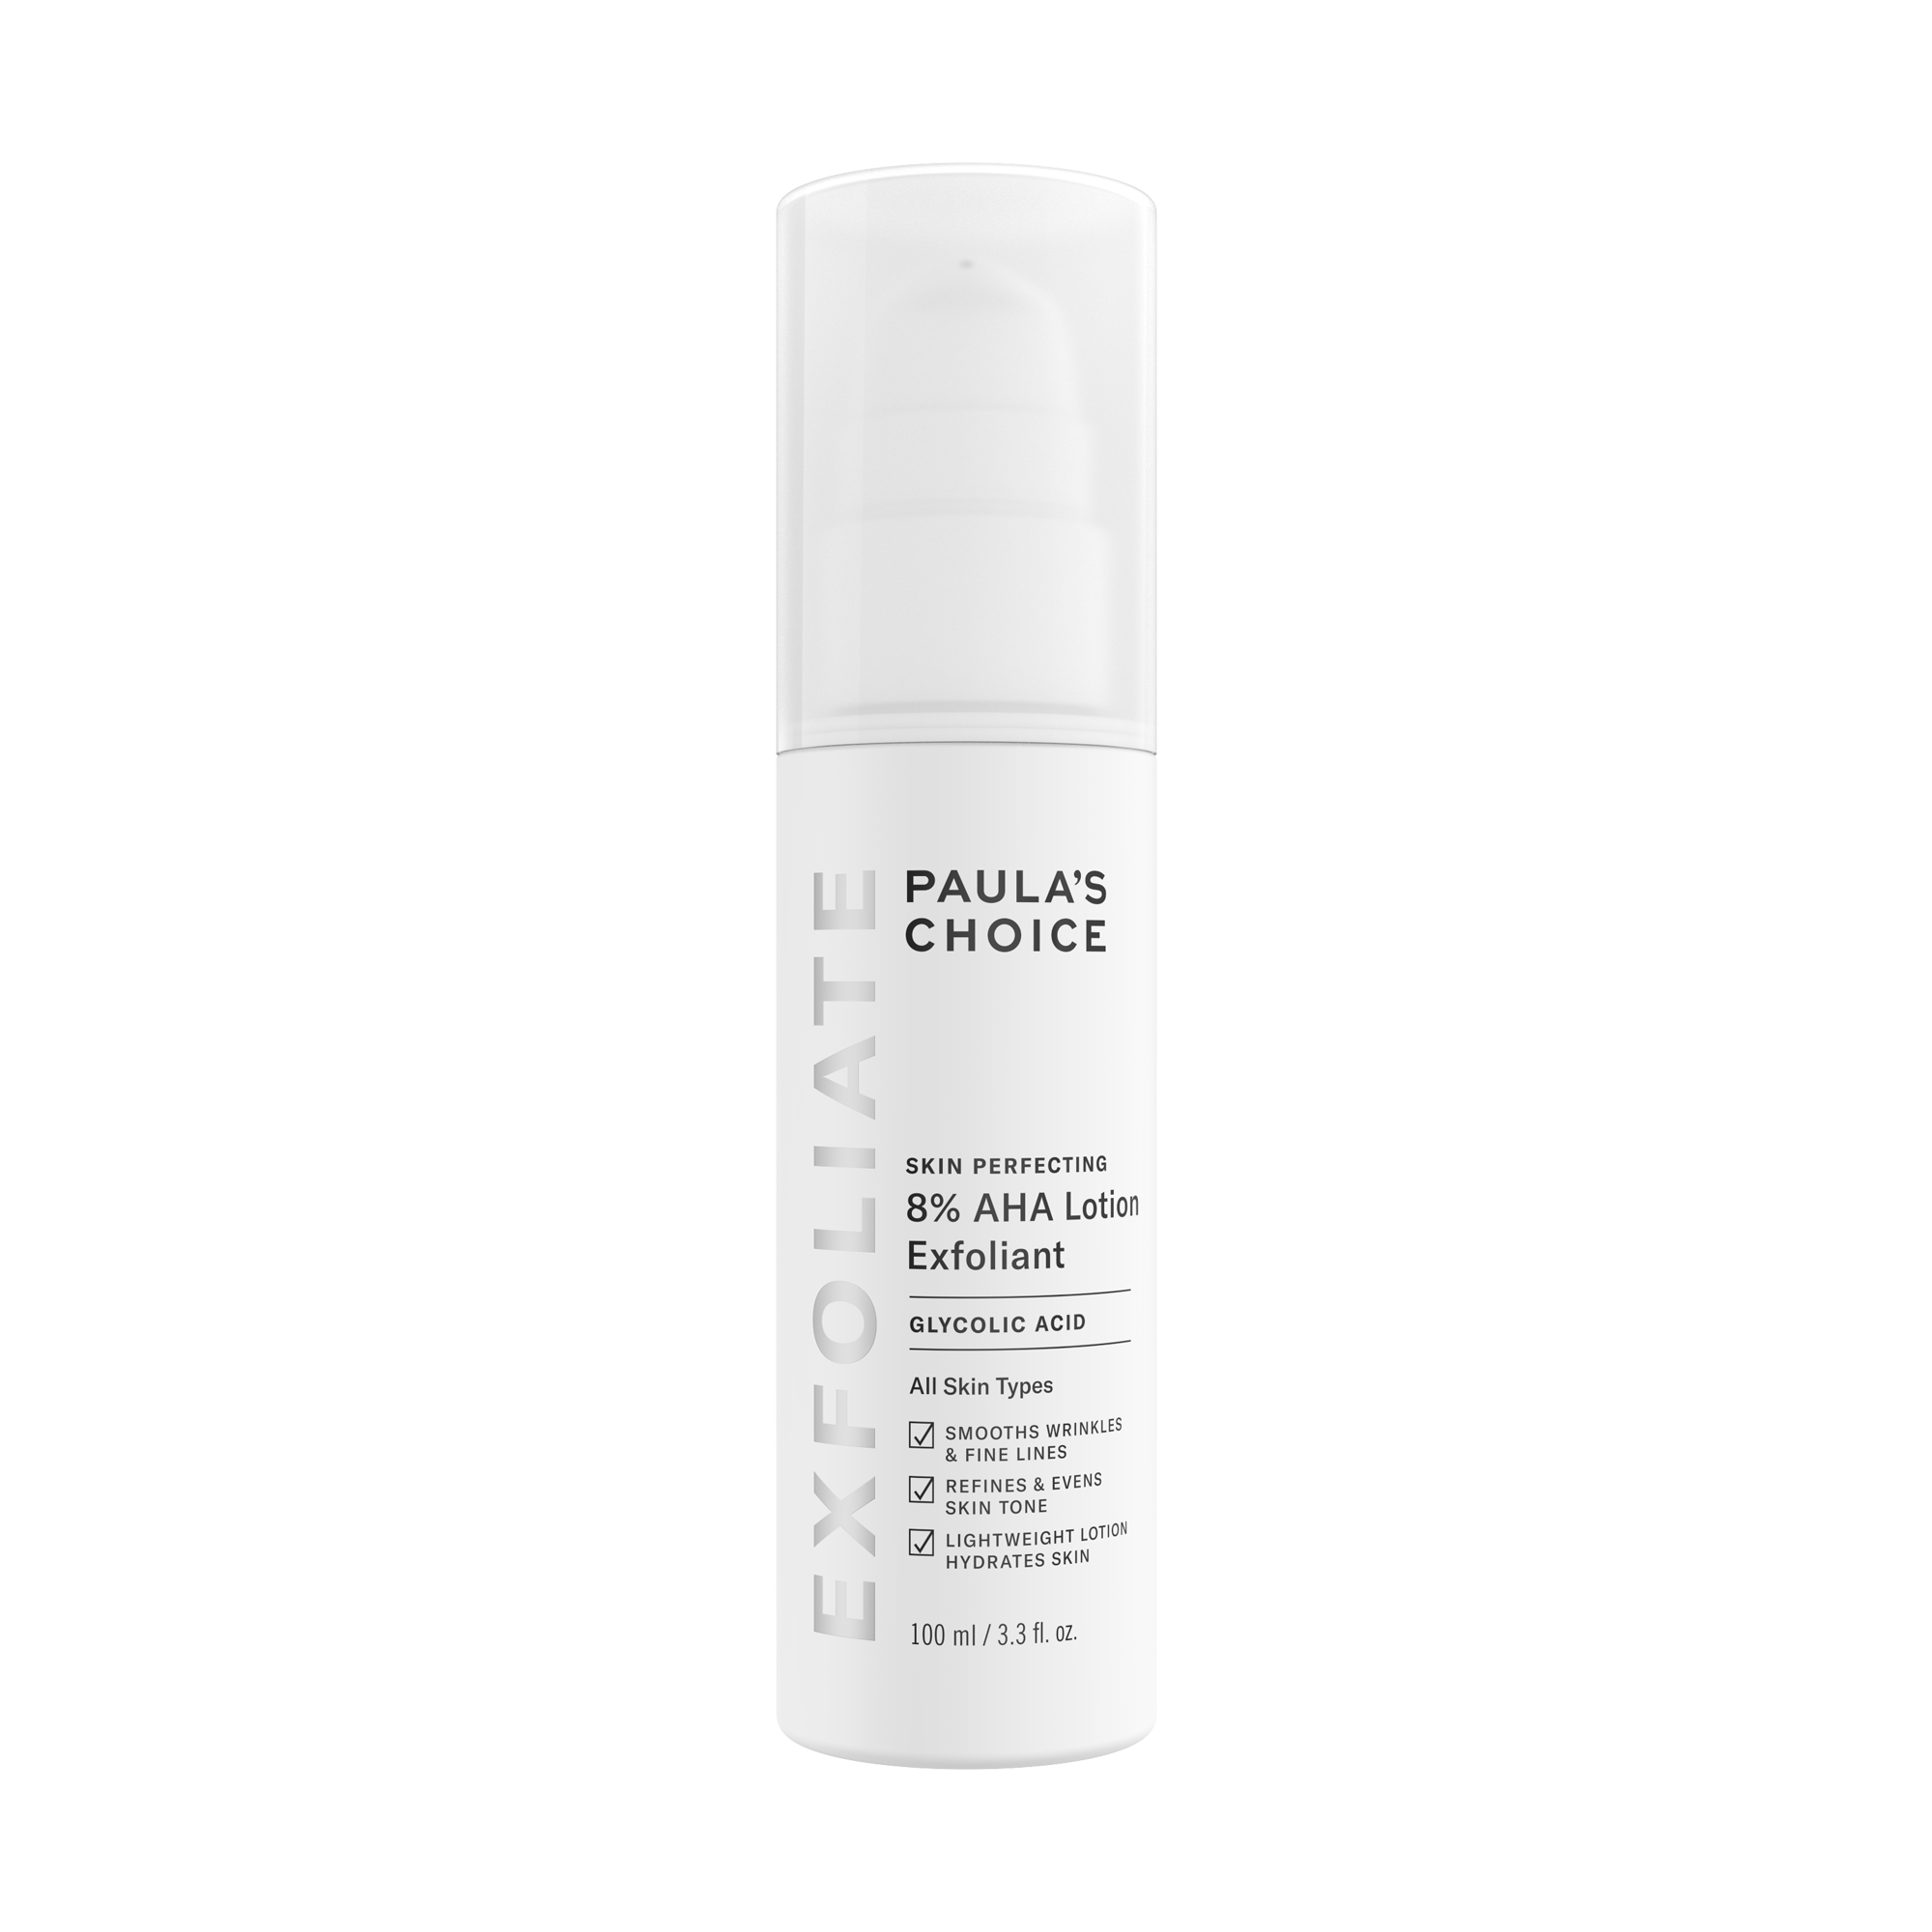 Best Natural Face Lotion For Sensitive Skin